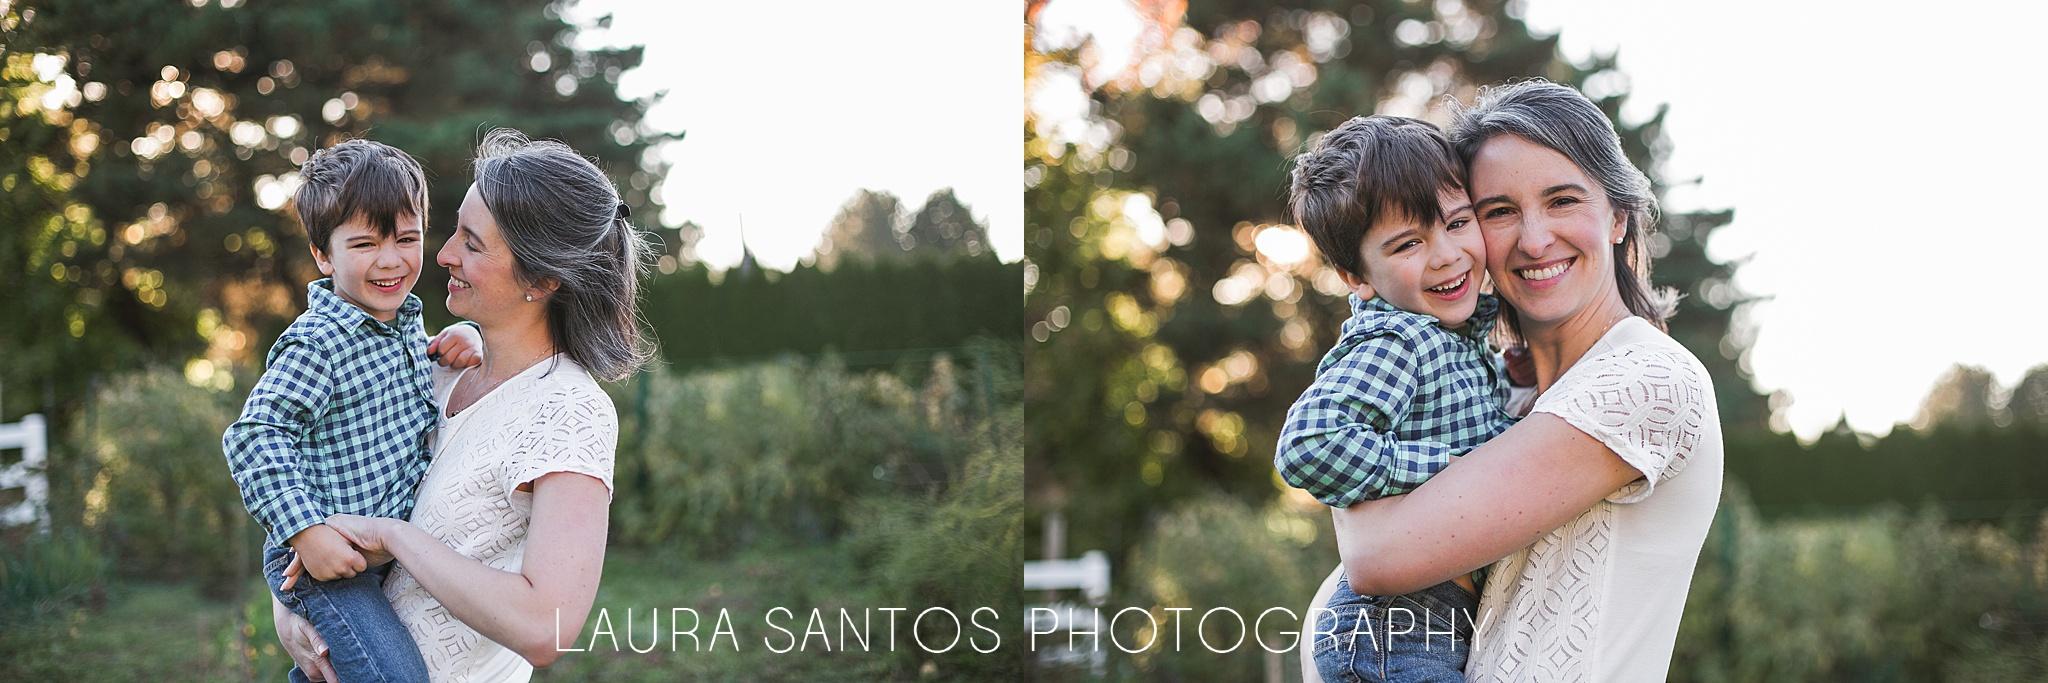 Laura Santos Photography Portland Oregon Family Photographer_0843.jpg